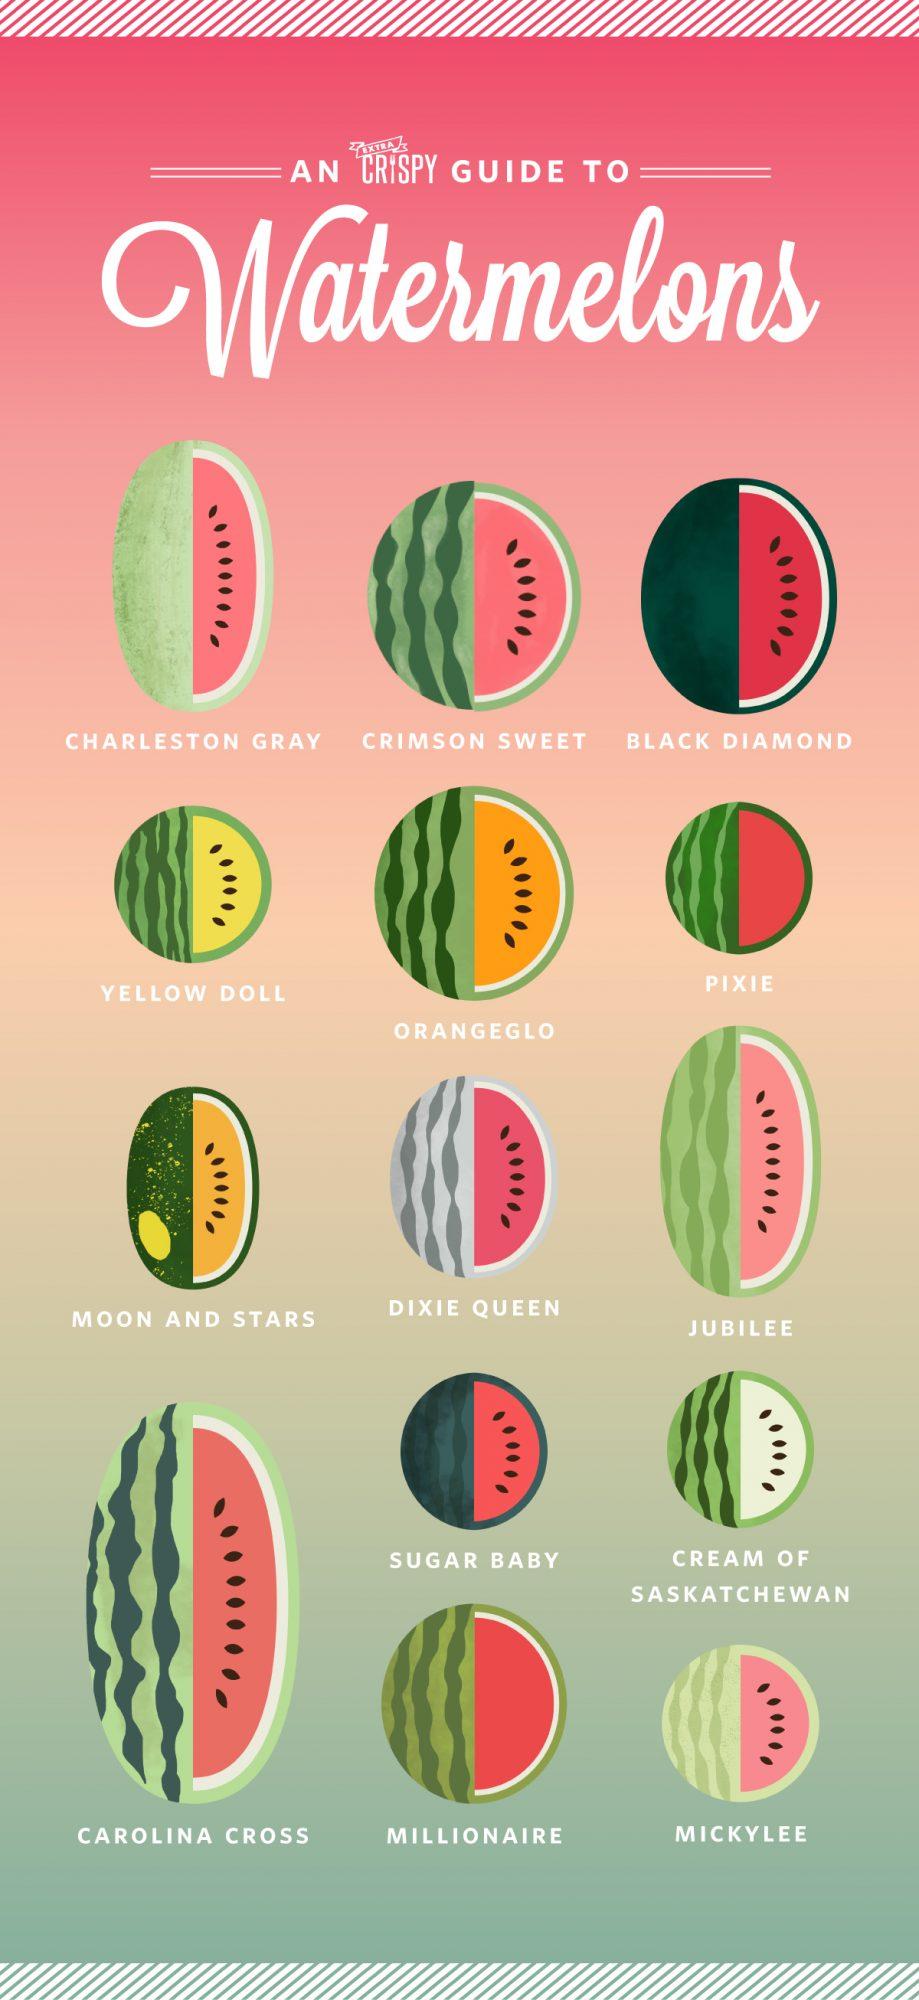 EC:  message-editor%2F1495715315596-watermelon-infographic